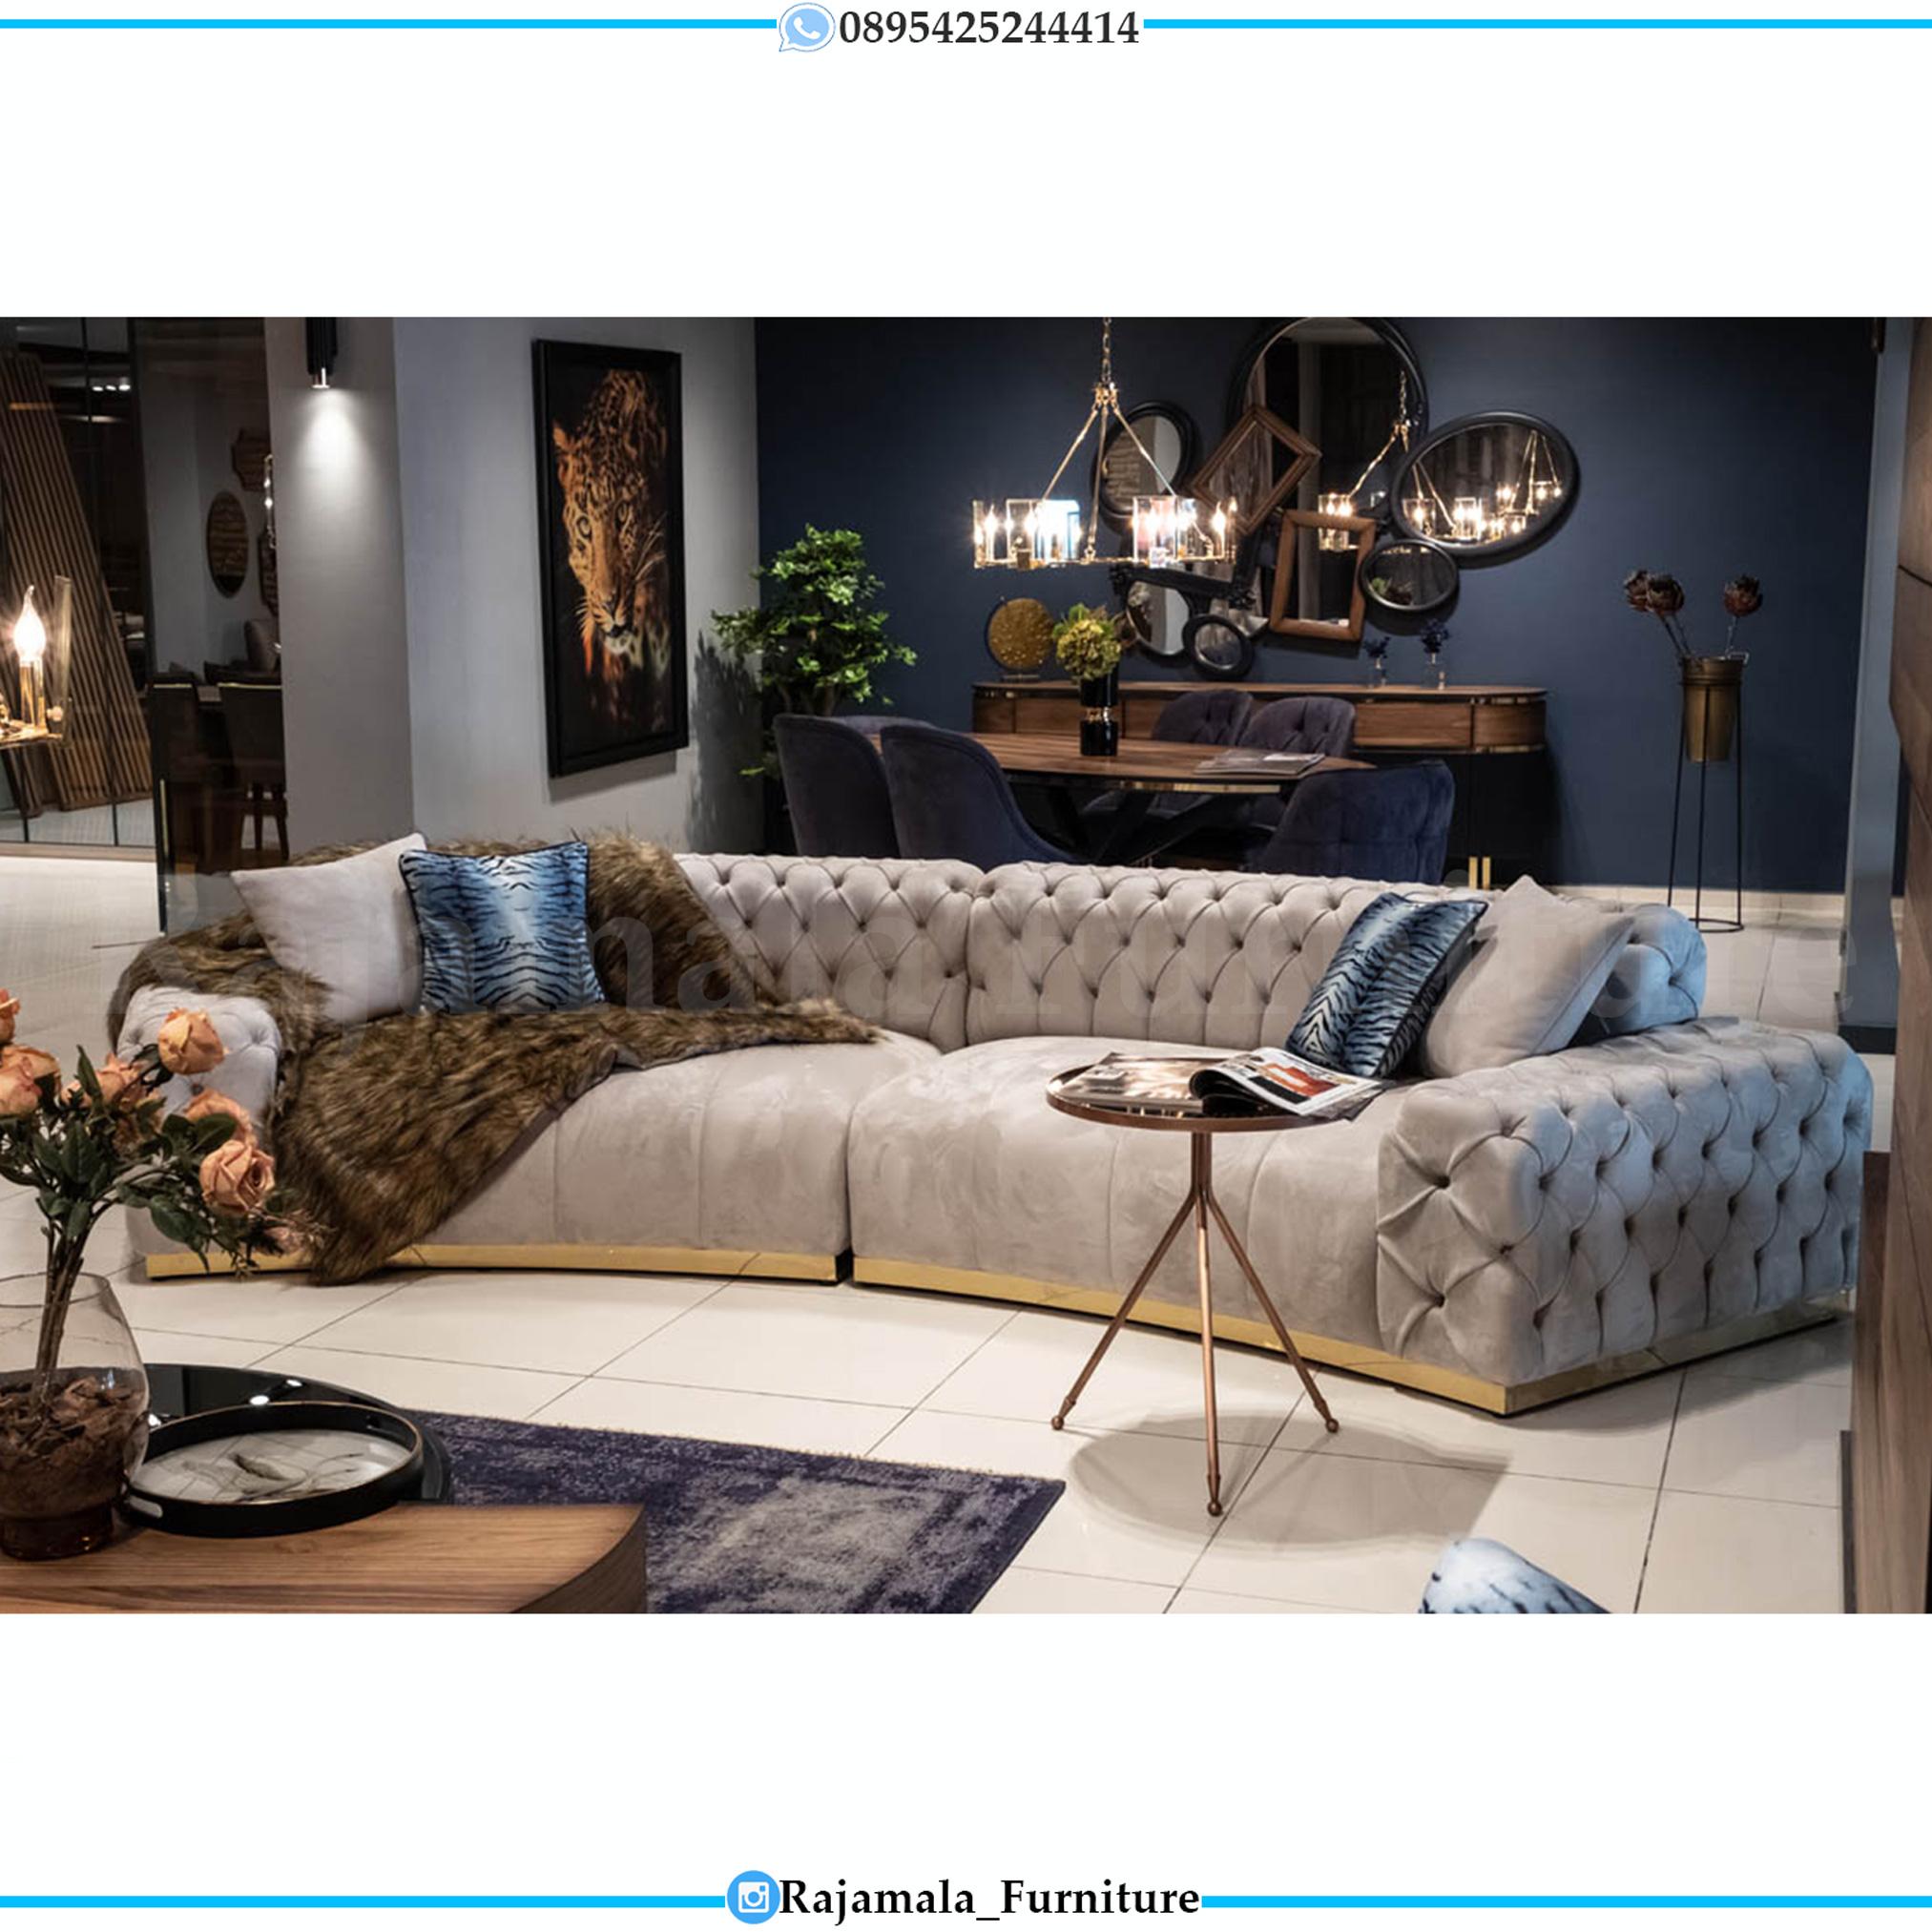 Set Sofa Tamu Minimalis Jepara Best Collection Furniture Jepara RM-0154